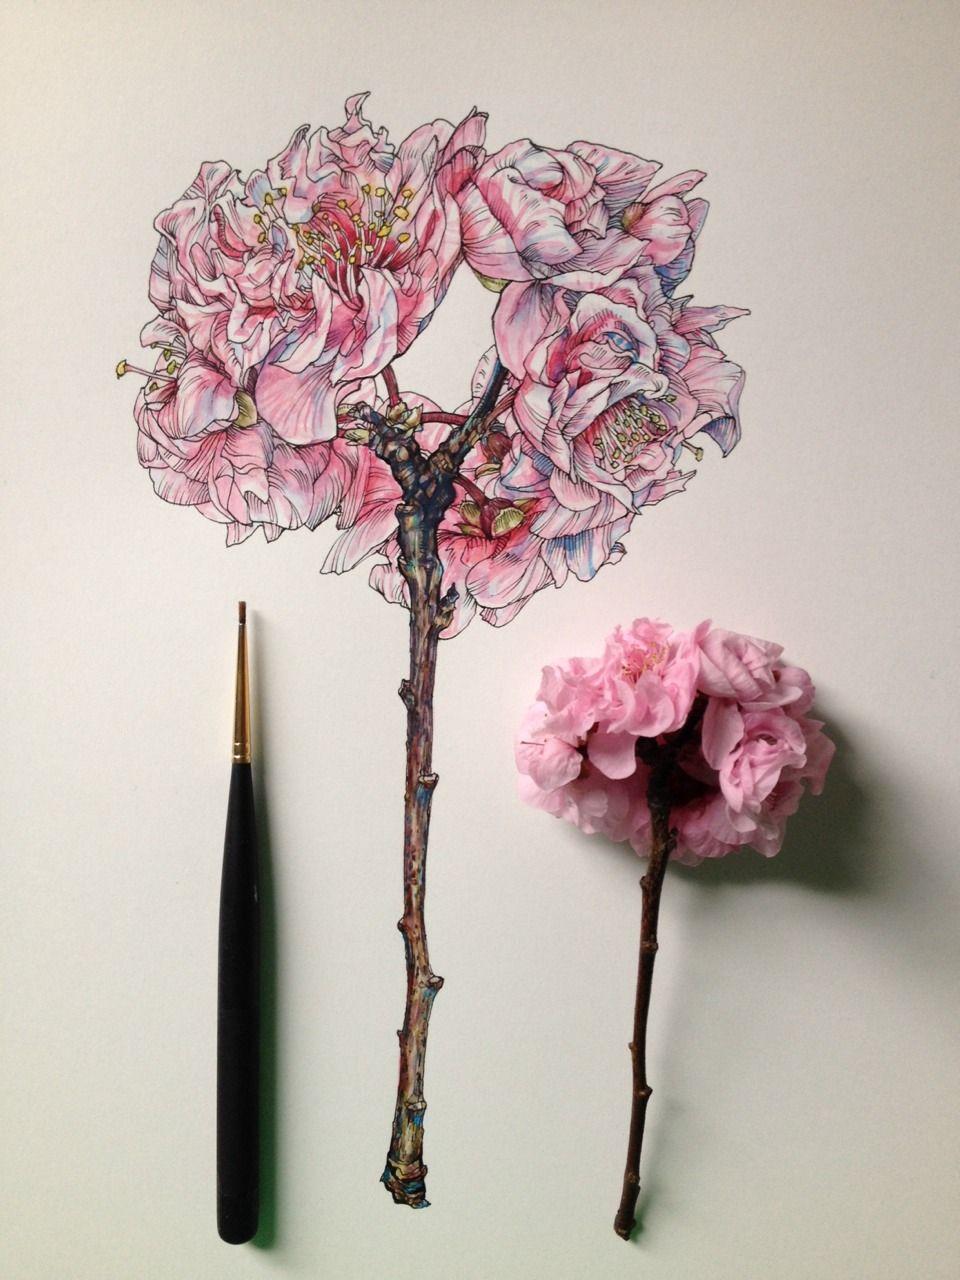 Flowers in progress scientific illustrator noel badges